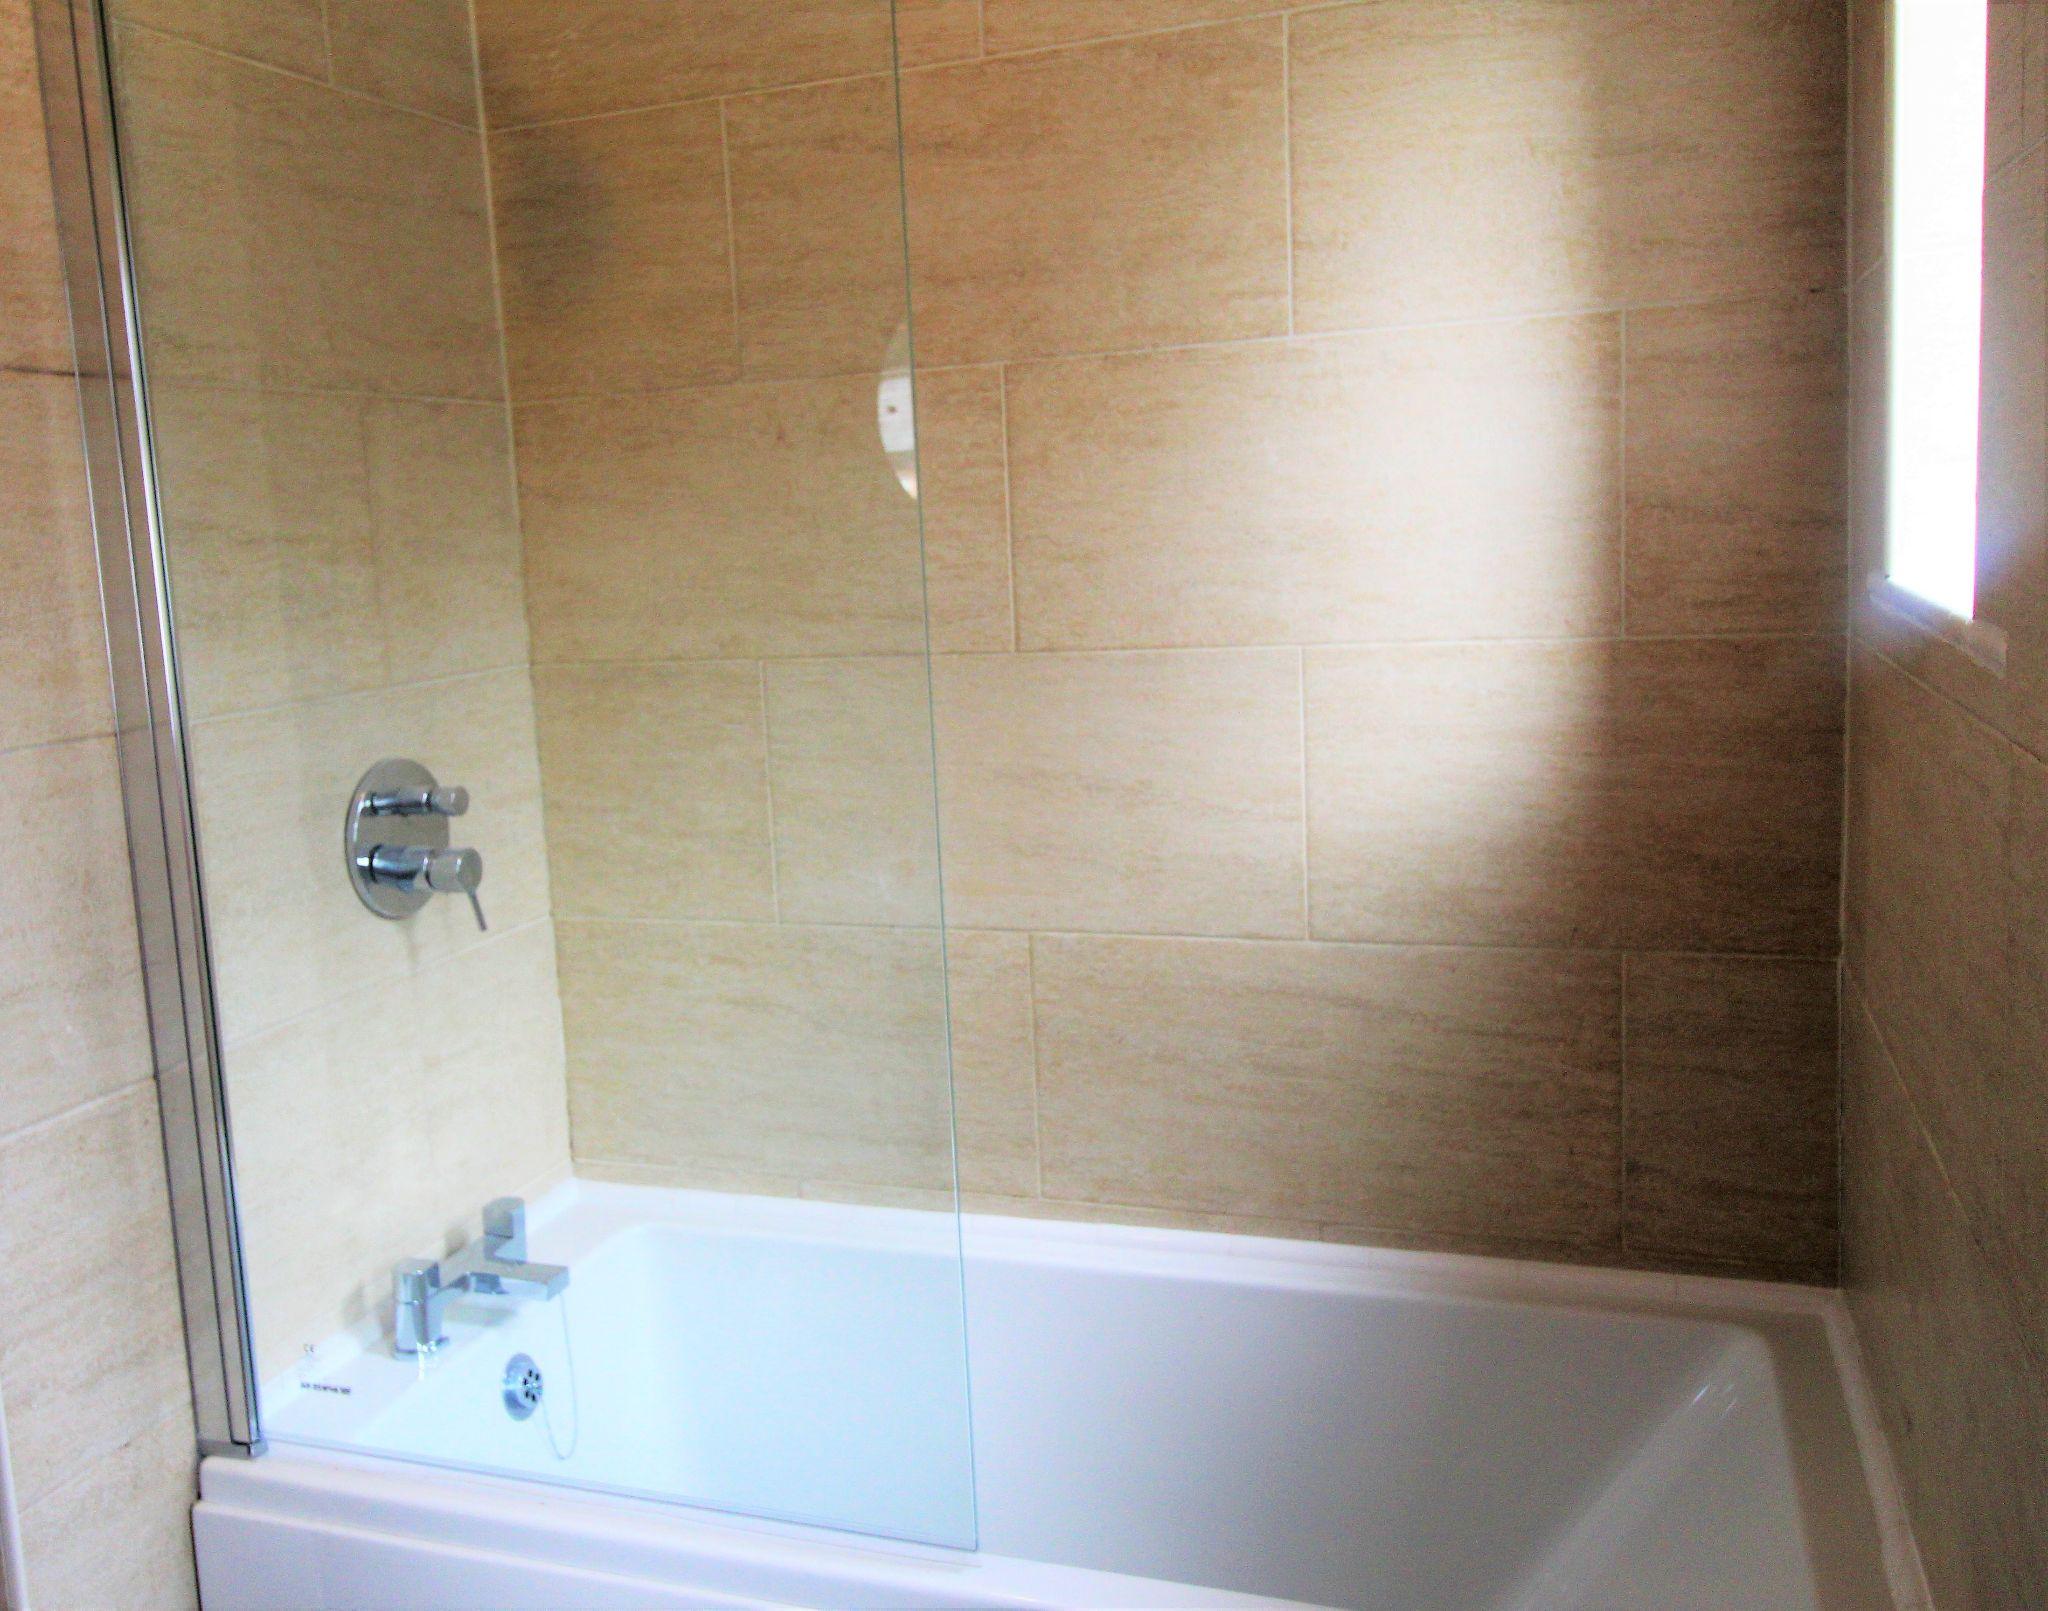 3 Bedroom Detached House For Sale - Bathroom 2